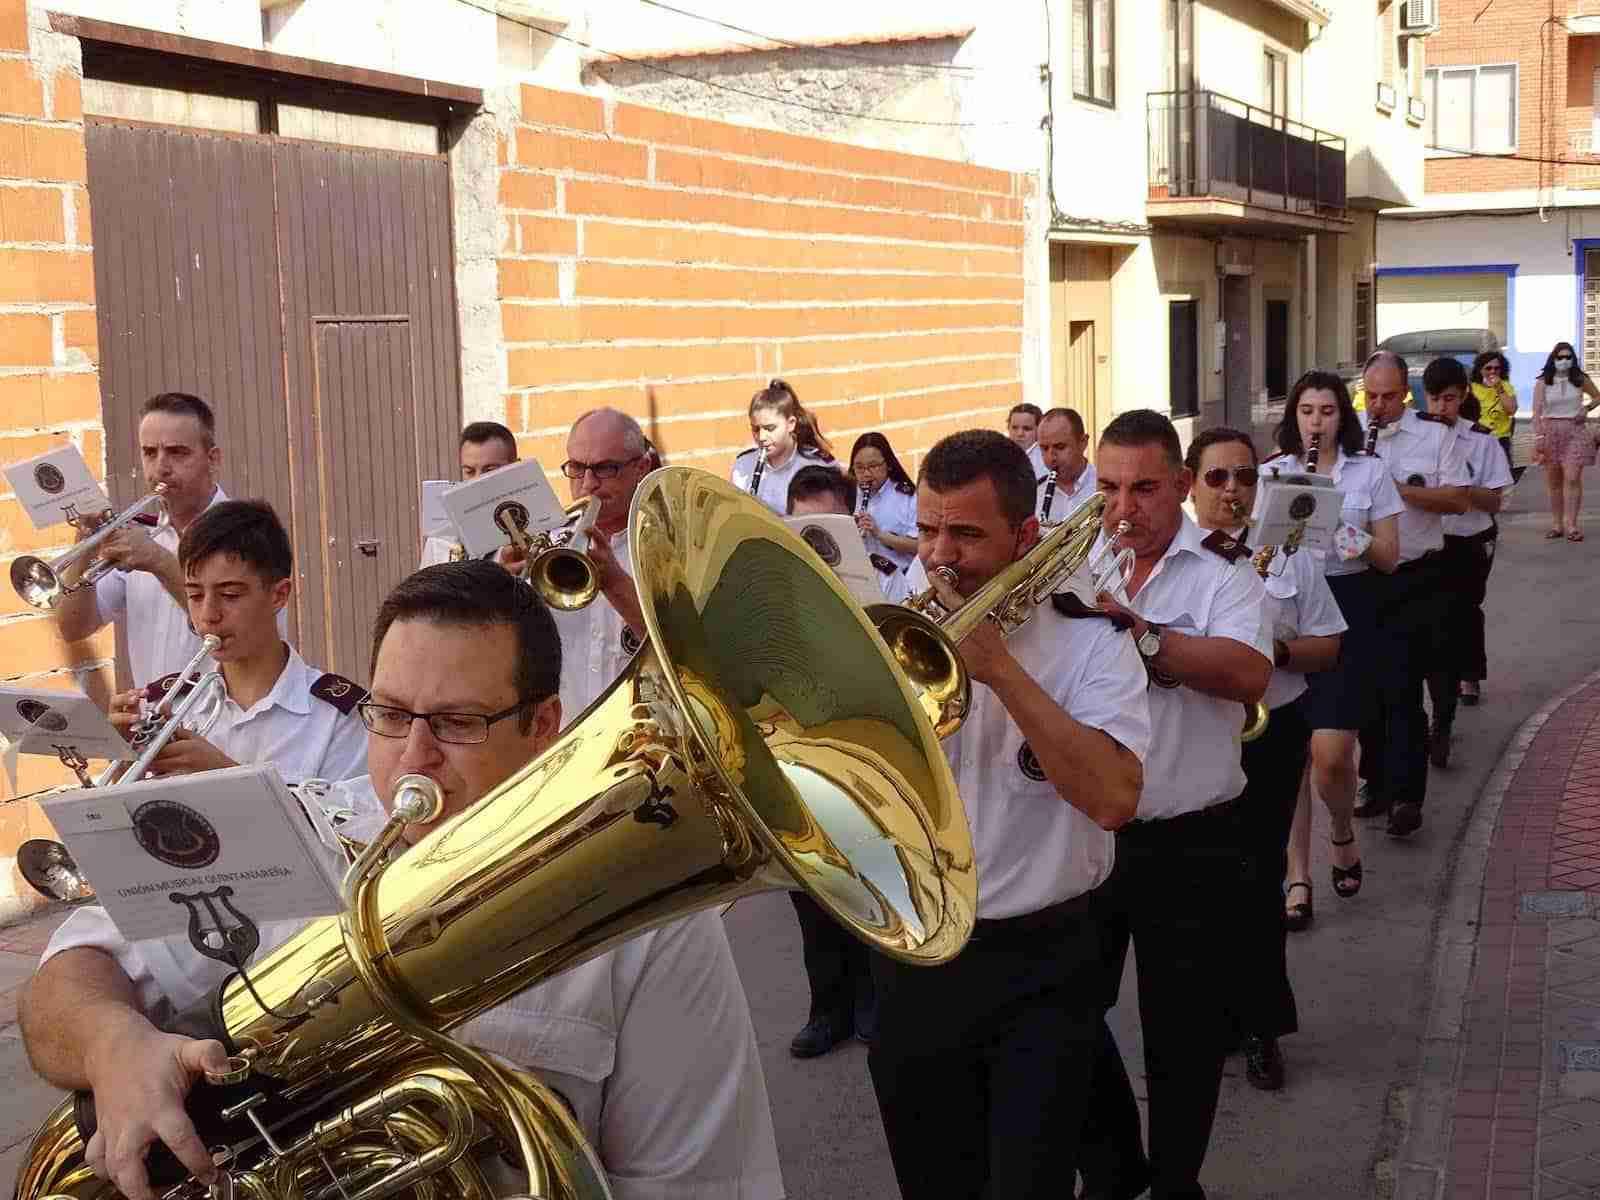 La UMQ lleva la música festiva por las calles de Quintanar de la Orden 16